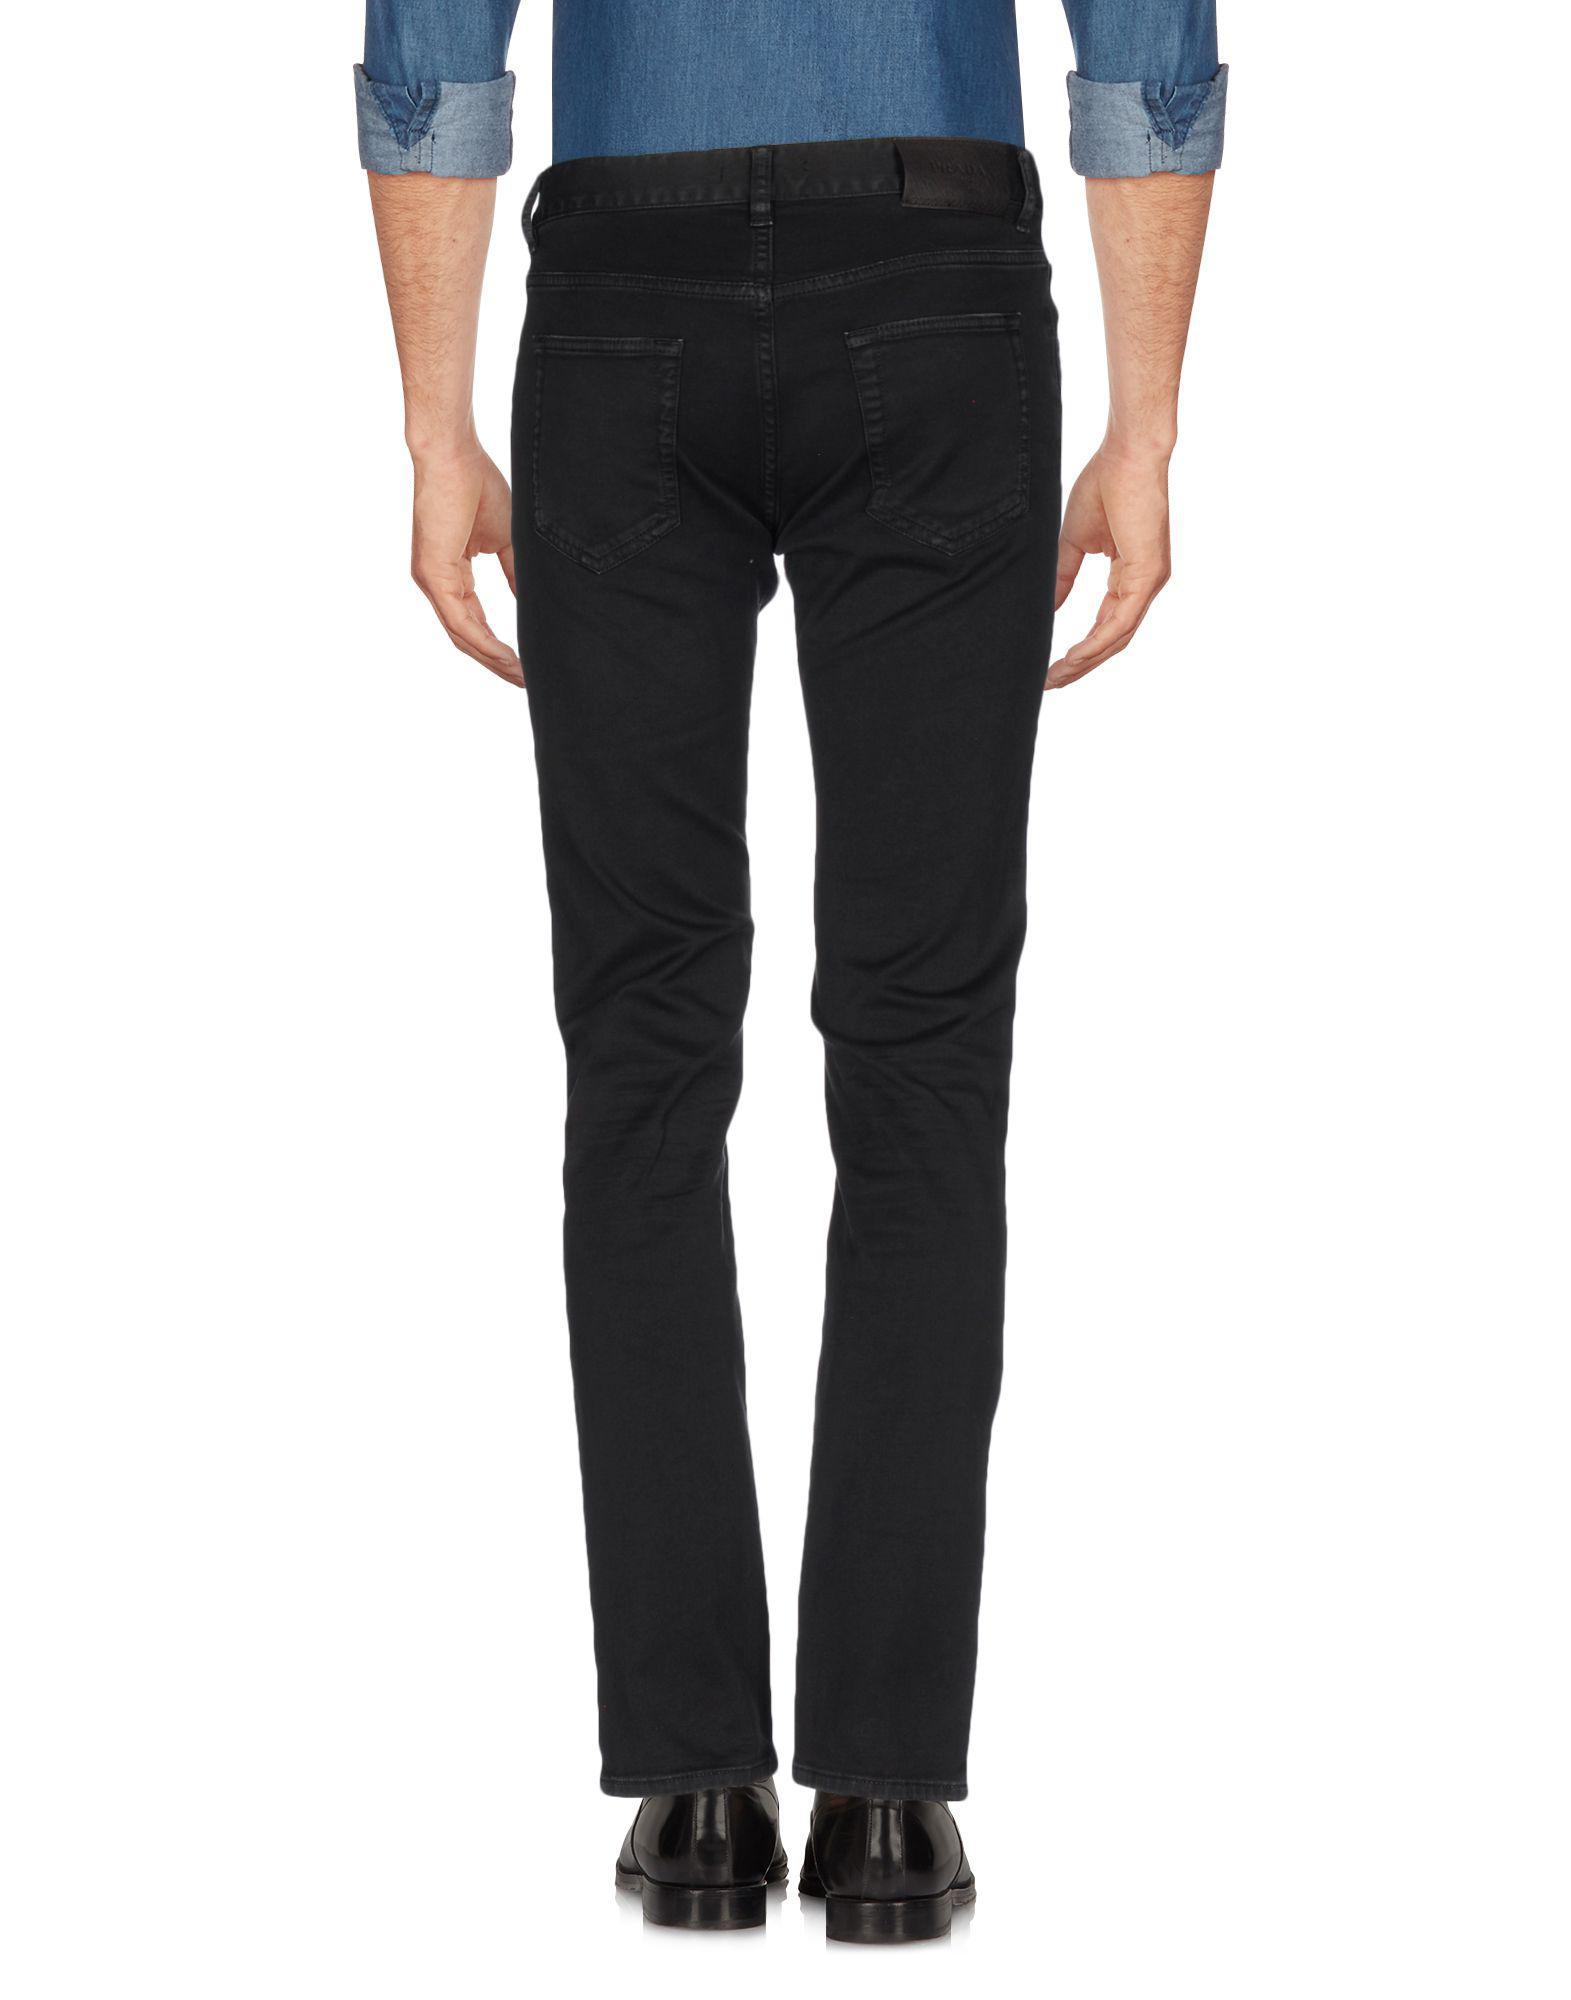 Prada Leather Casual Pants in Black for Men